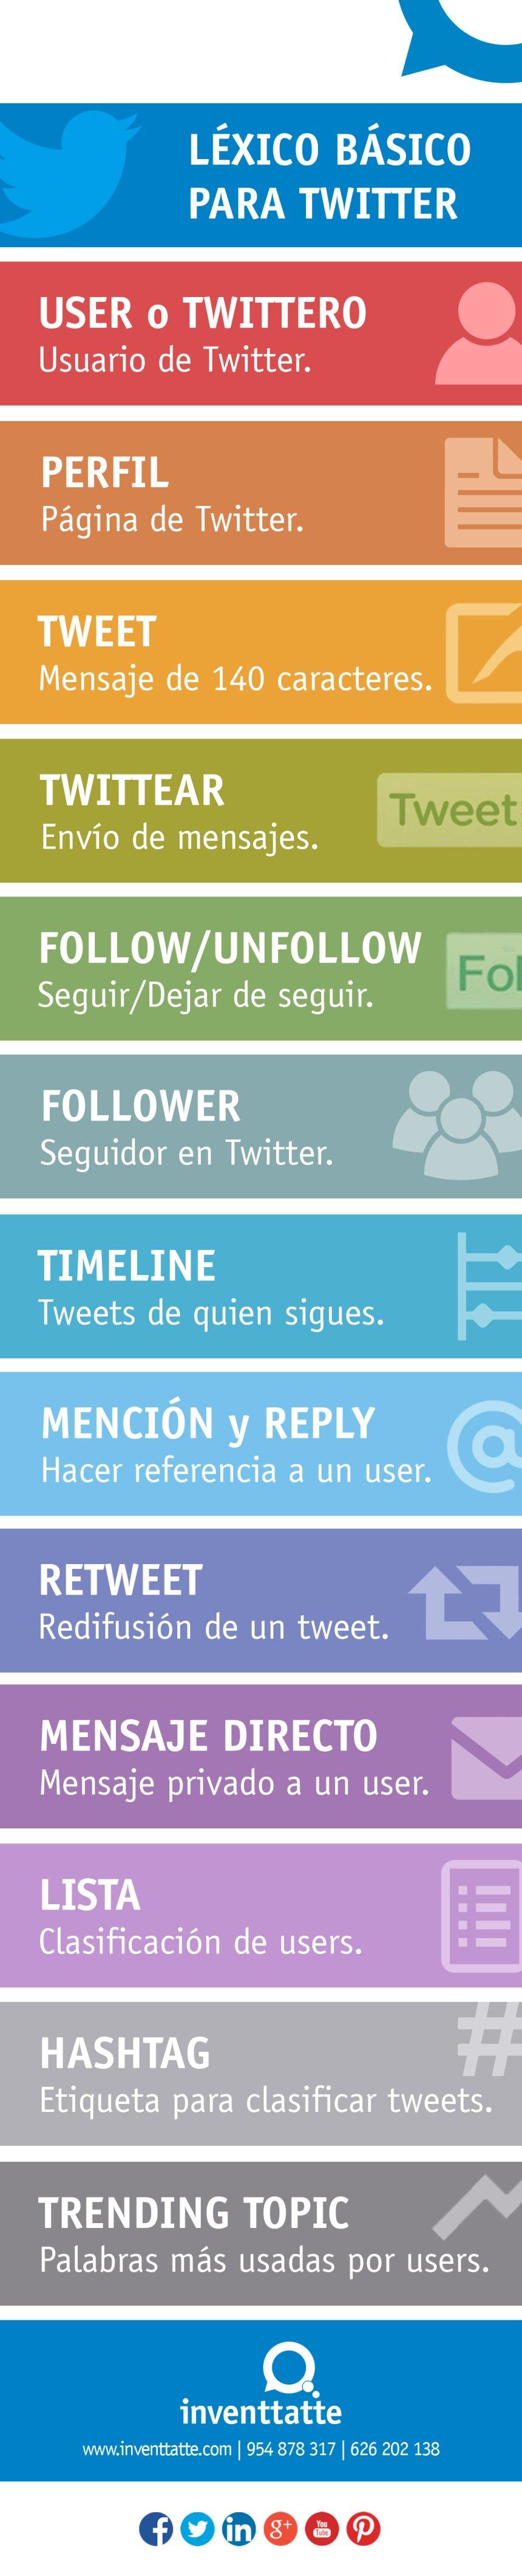 Glosario básico de Twitter